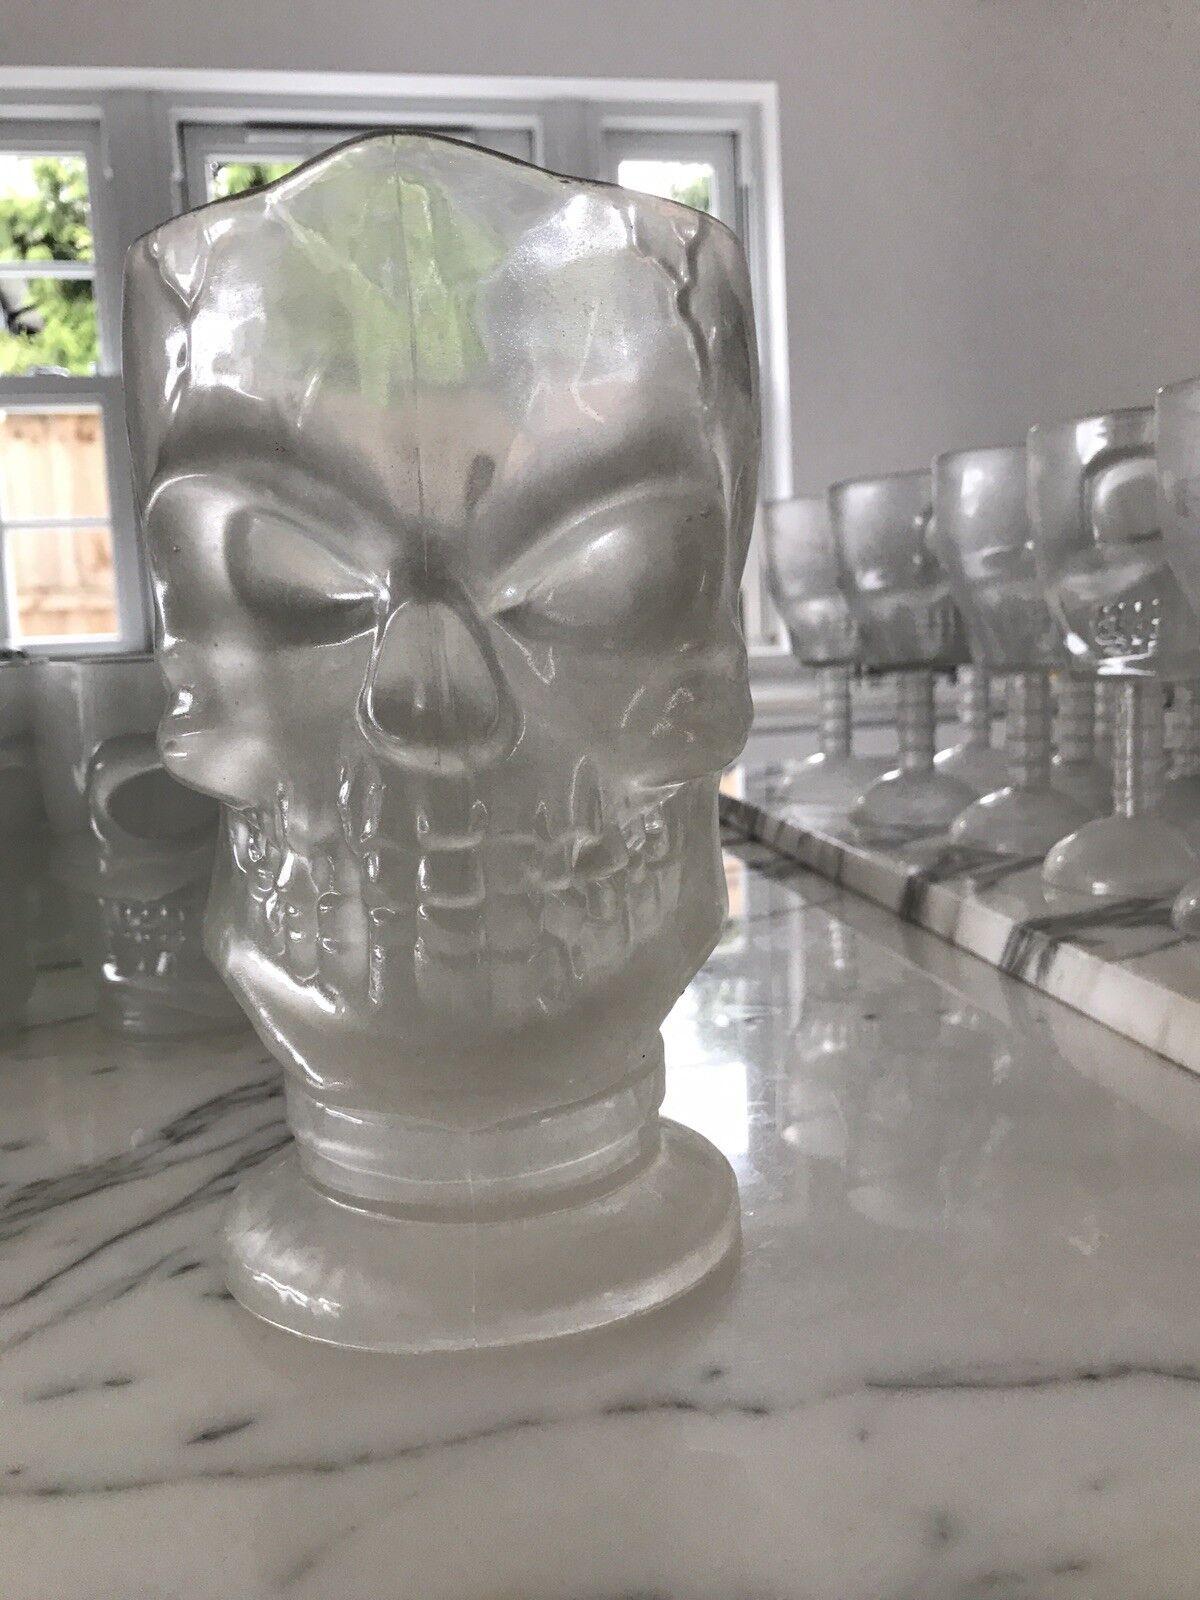 Halloween Party Cups gobelets verres carafe Glow in the Dark